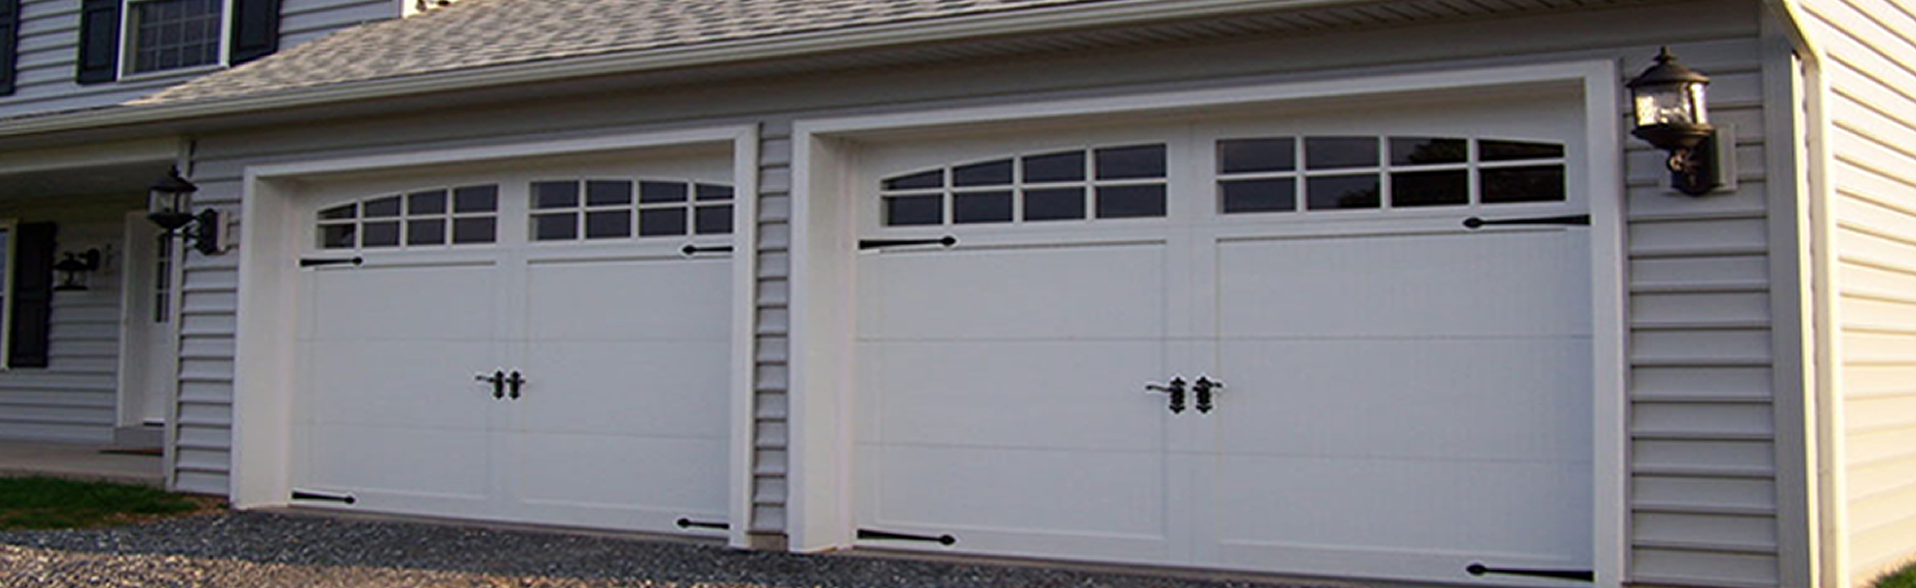 Anytime Garage Door Repair Coupons Janesville Wi Near Me